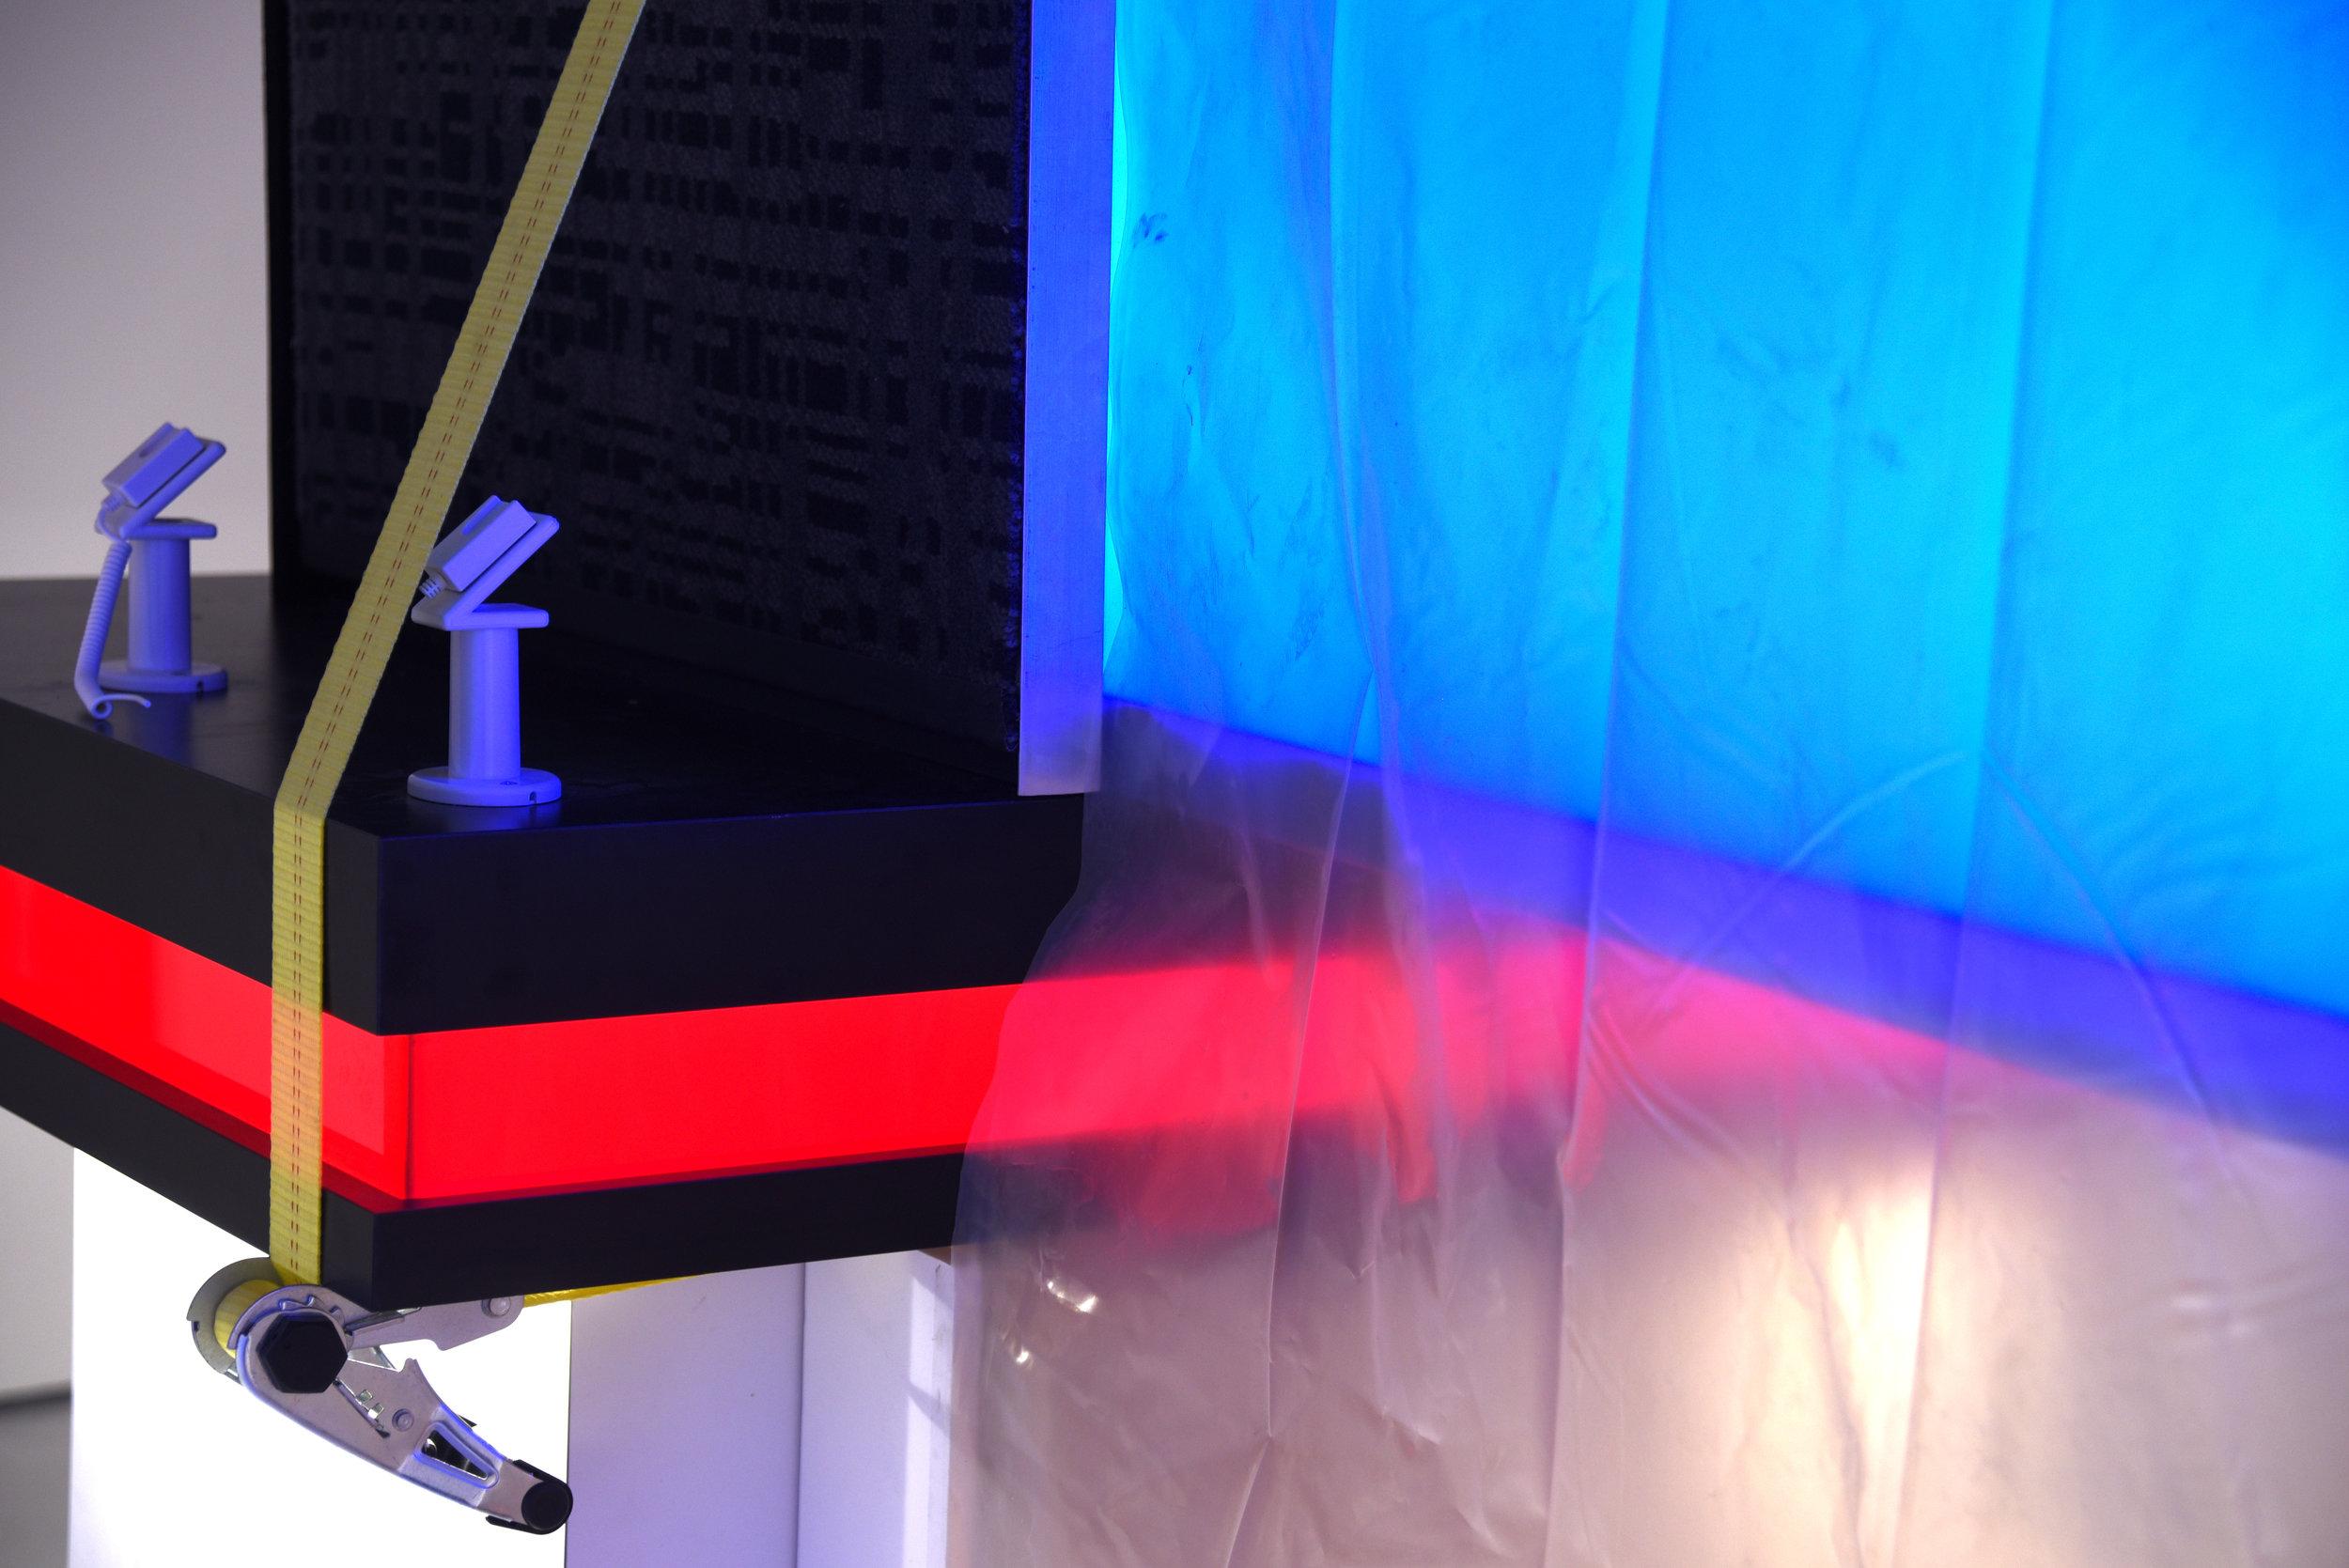 Jonathan Mildenberg  I.N.C.H. ,2018 (detail) wood, Formica, plexiglass, LED lights, ratchet straps, prefabricated cellphone security displays, carpet, foam, plastic tarp, rubber,tile, cardboard, steel, prefabricated light box, subwoofer, aluminum, self-adhesive vinyl, drywall, bed sheet, yoga mat, fabricated,neon light, mirror, porcelain tile, epoxy dimensions variable (JM6)